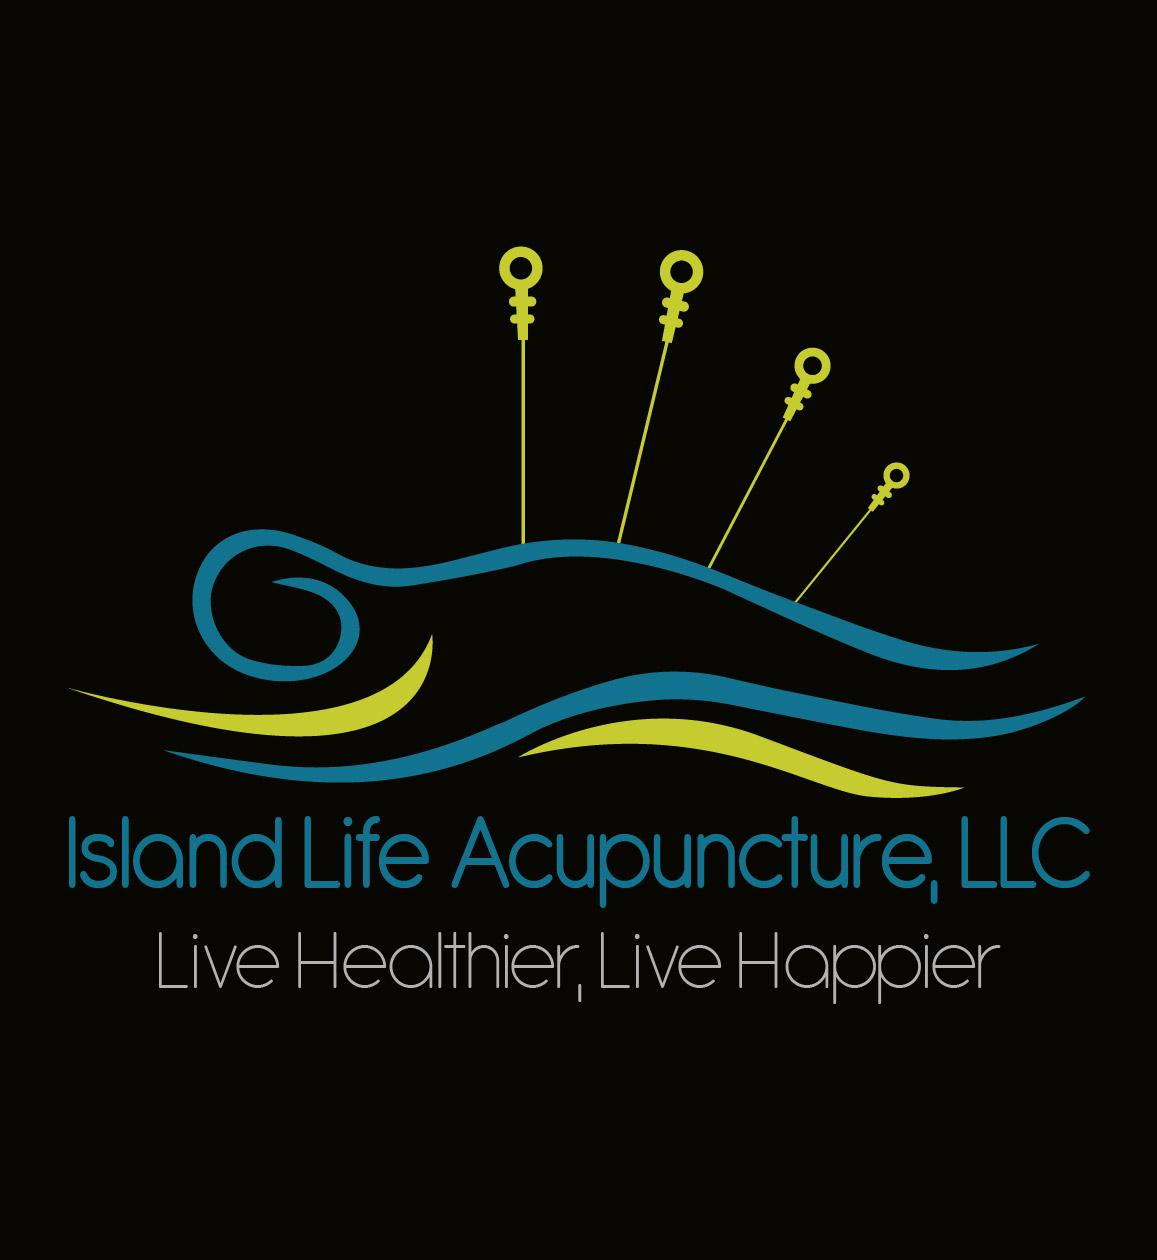 Island Life Acupuncture